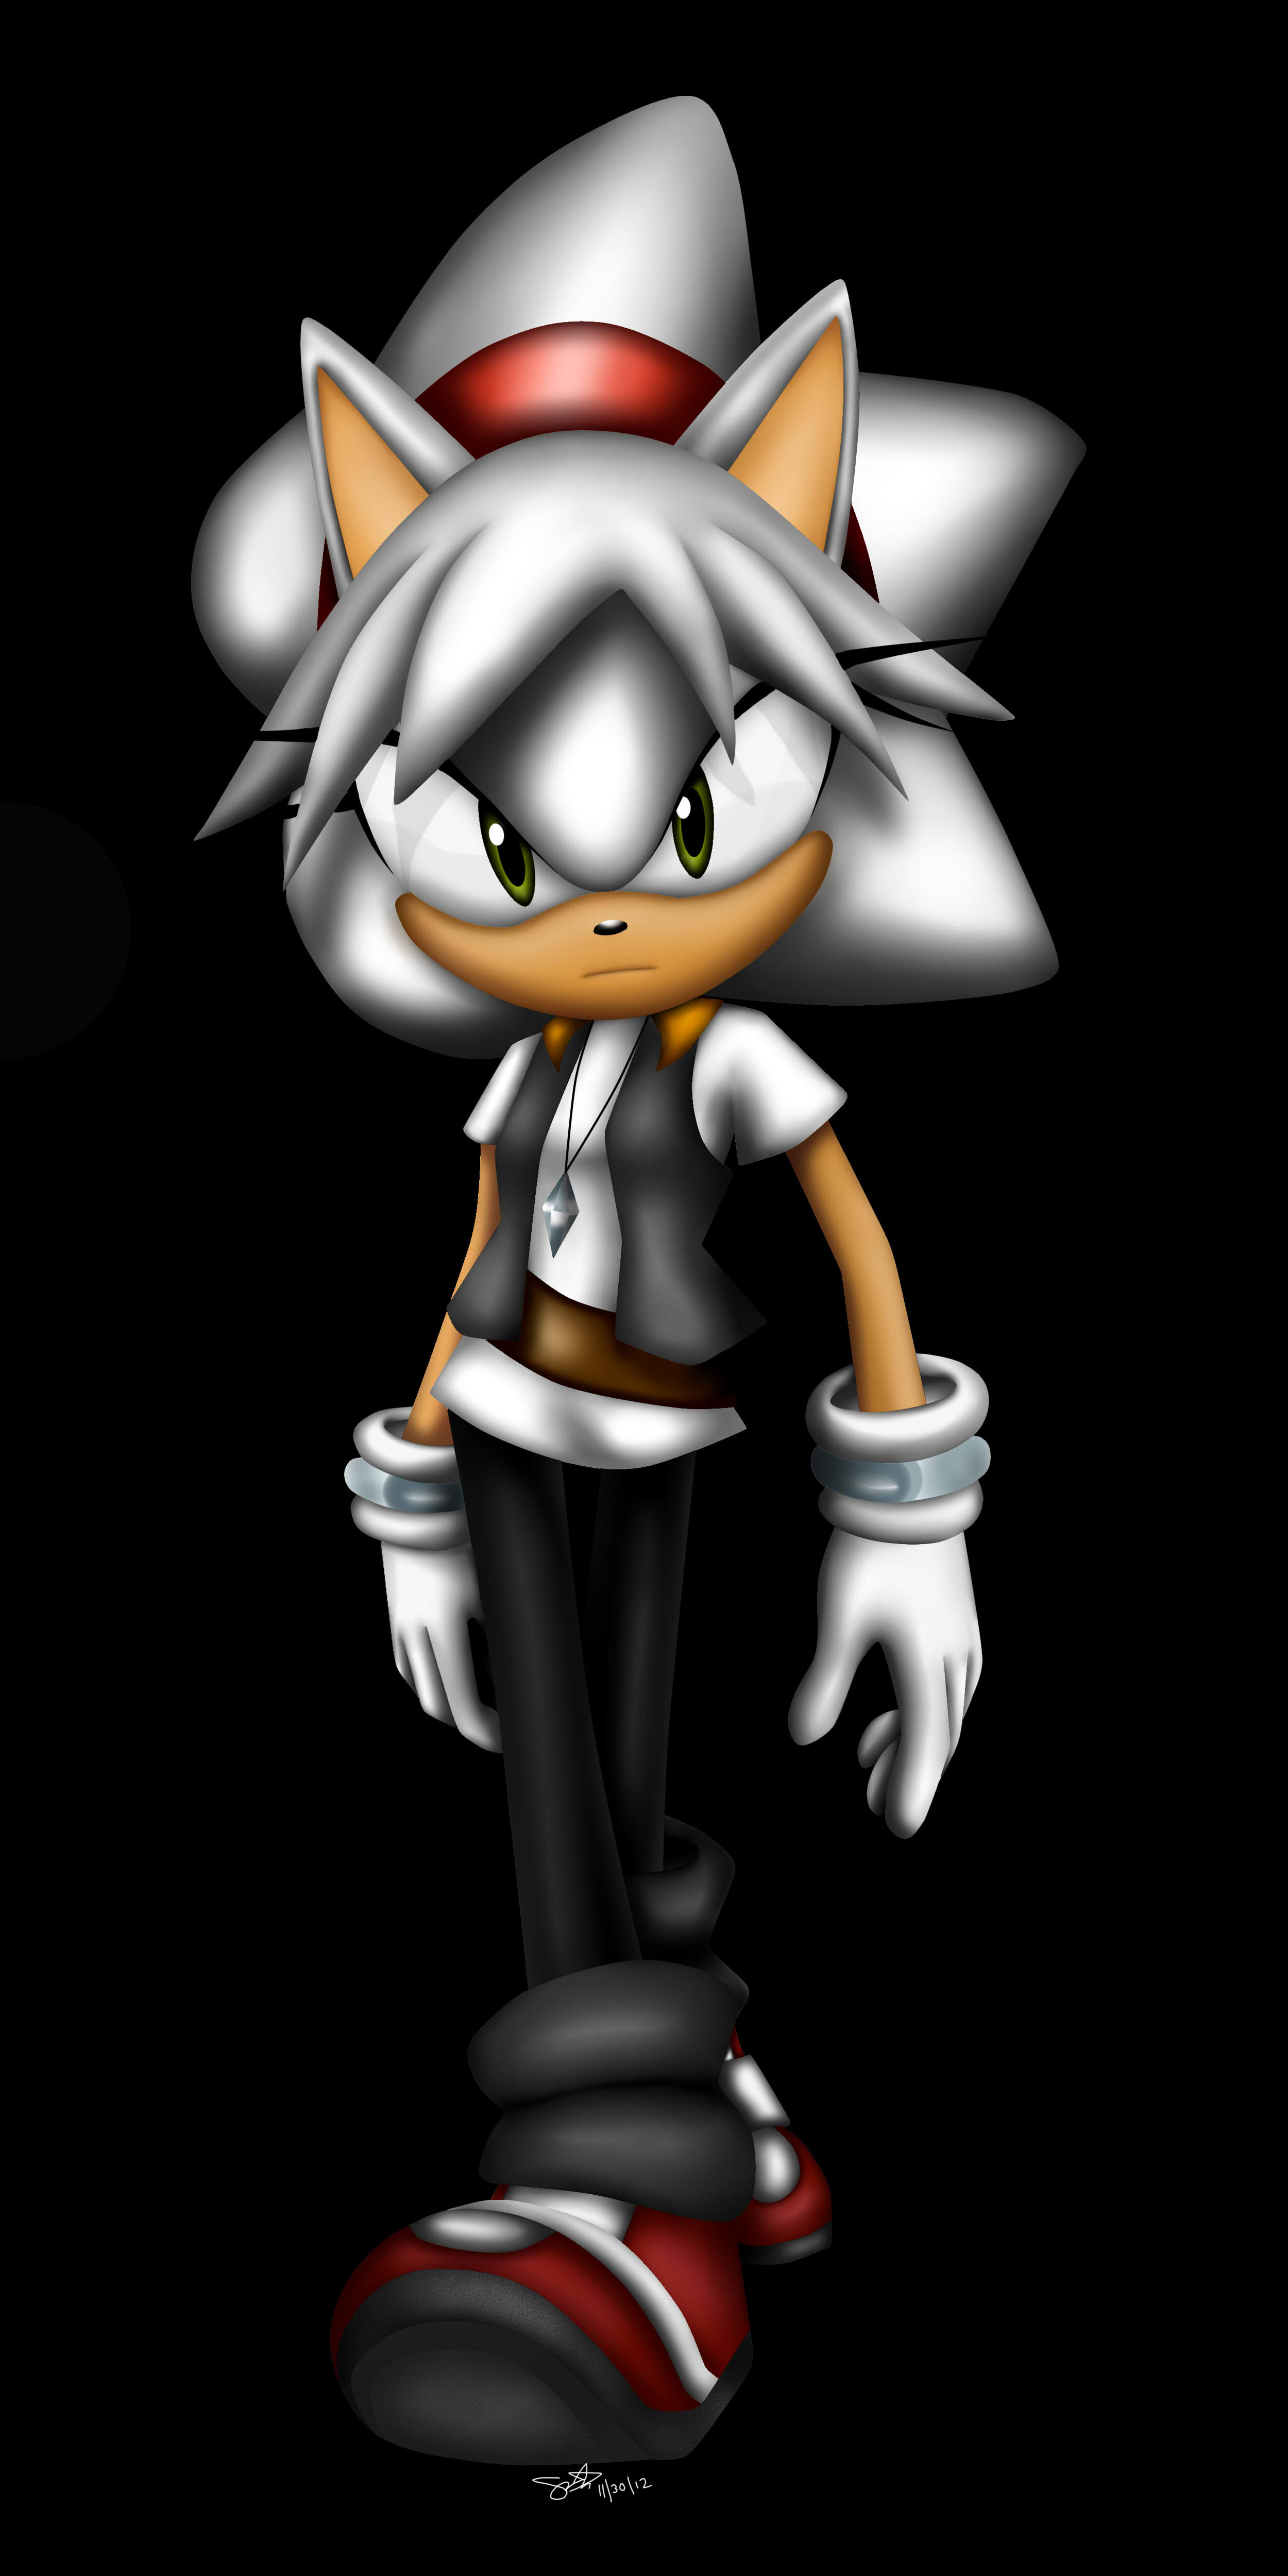 Zaphira the Hedgehog - Sonicsociety Wiki